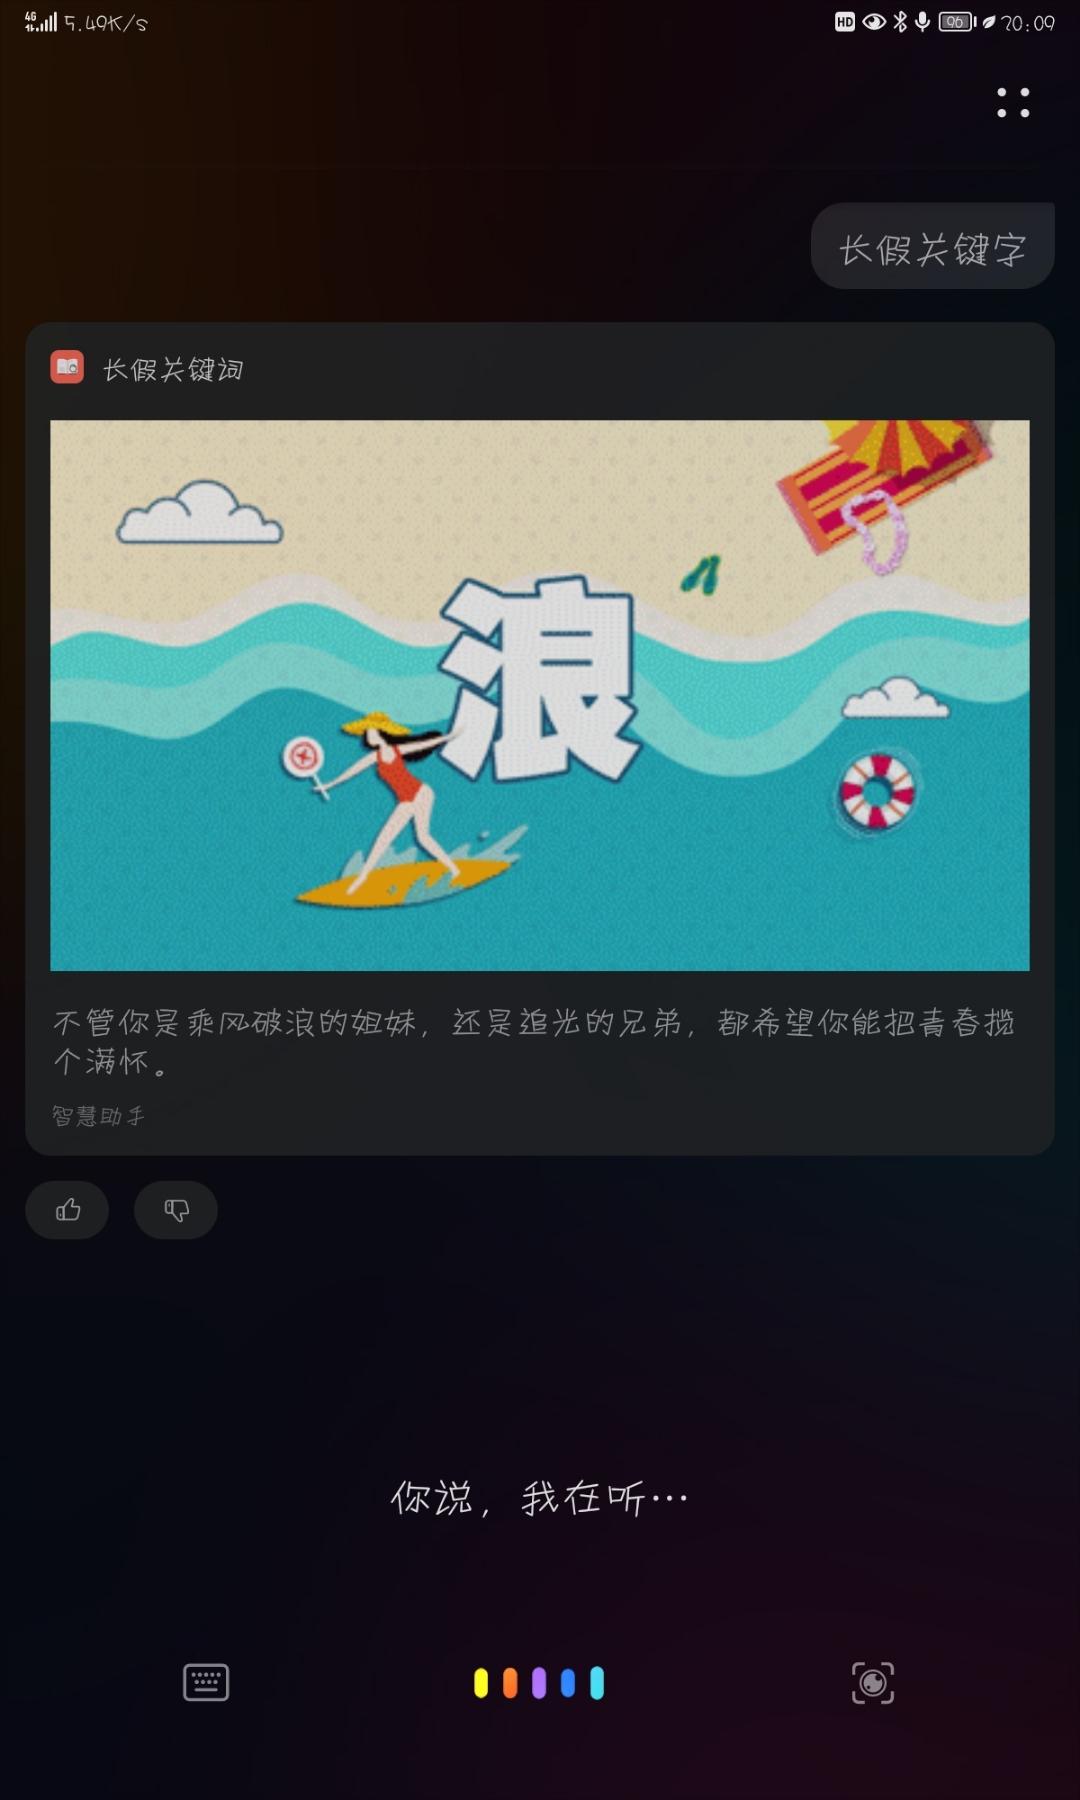 Screenshot_20210917_200905_com.huawei.vassistant.jpg